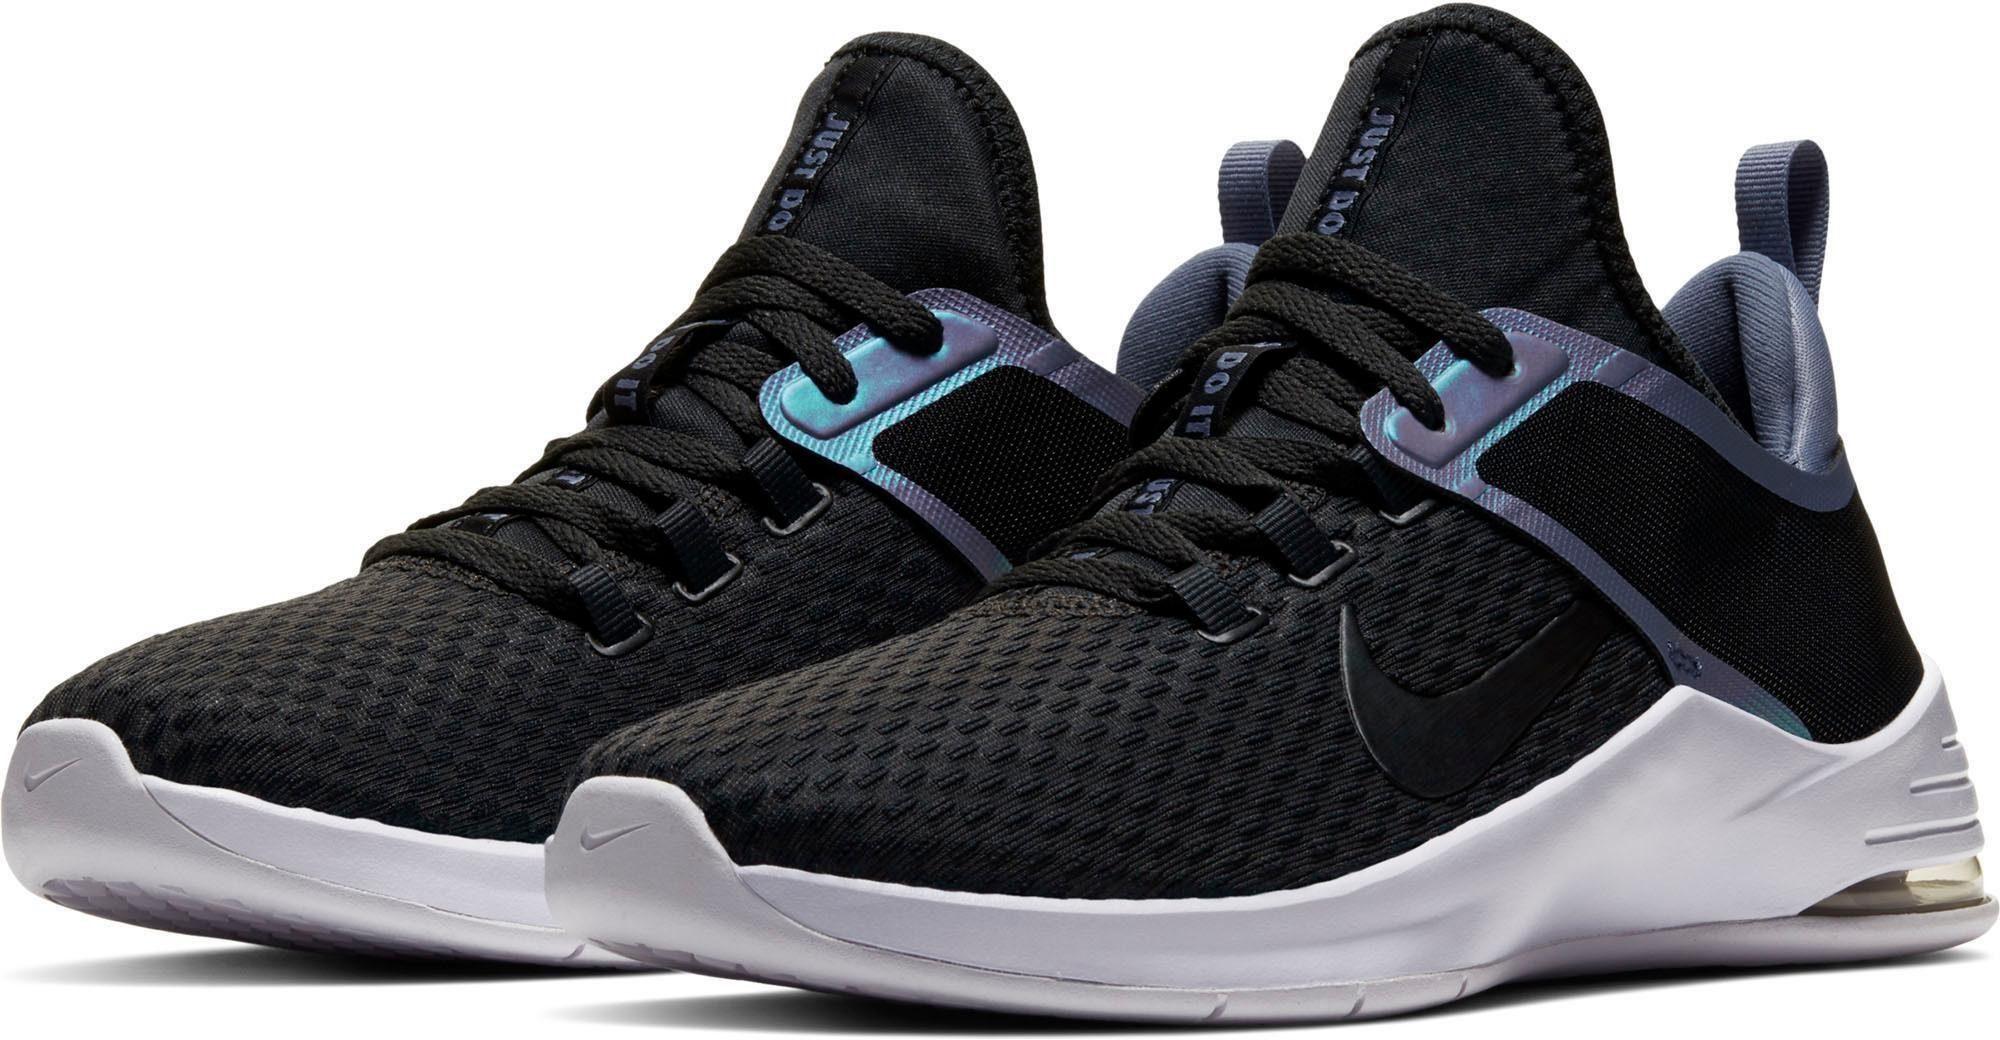 Nike Fitnessschuh Wmns Air Max Bella Tr 2 | Schuhe > Sportschuhe > Fitnessschuhe | Nike